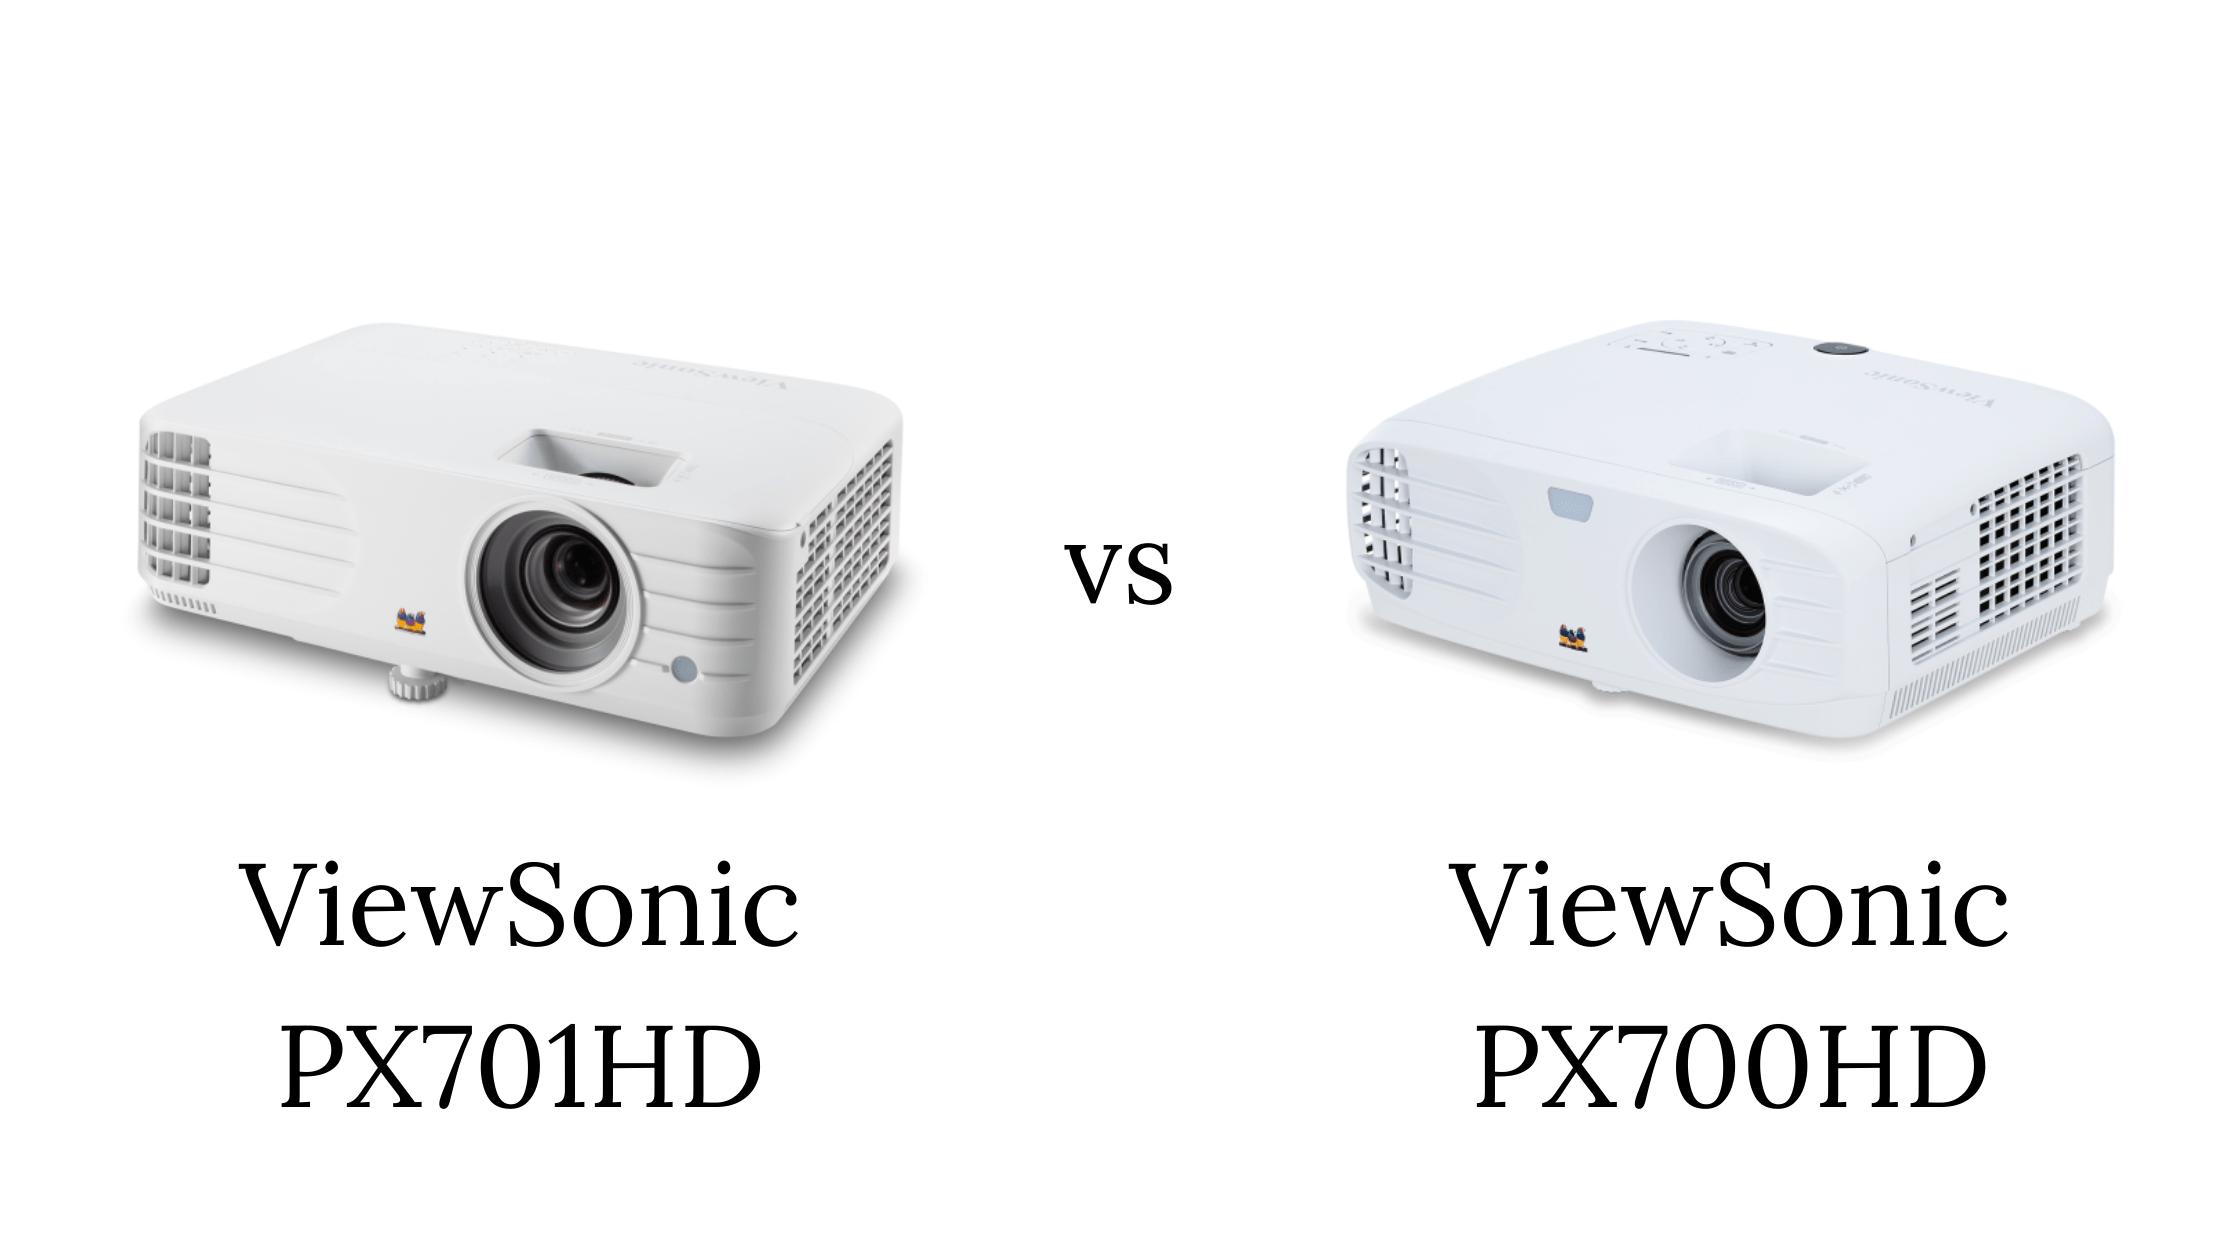 ViewSonic PX701HD vs PX700HD